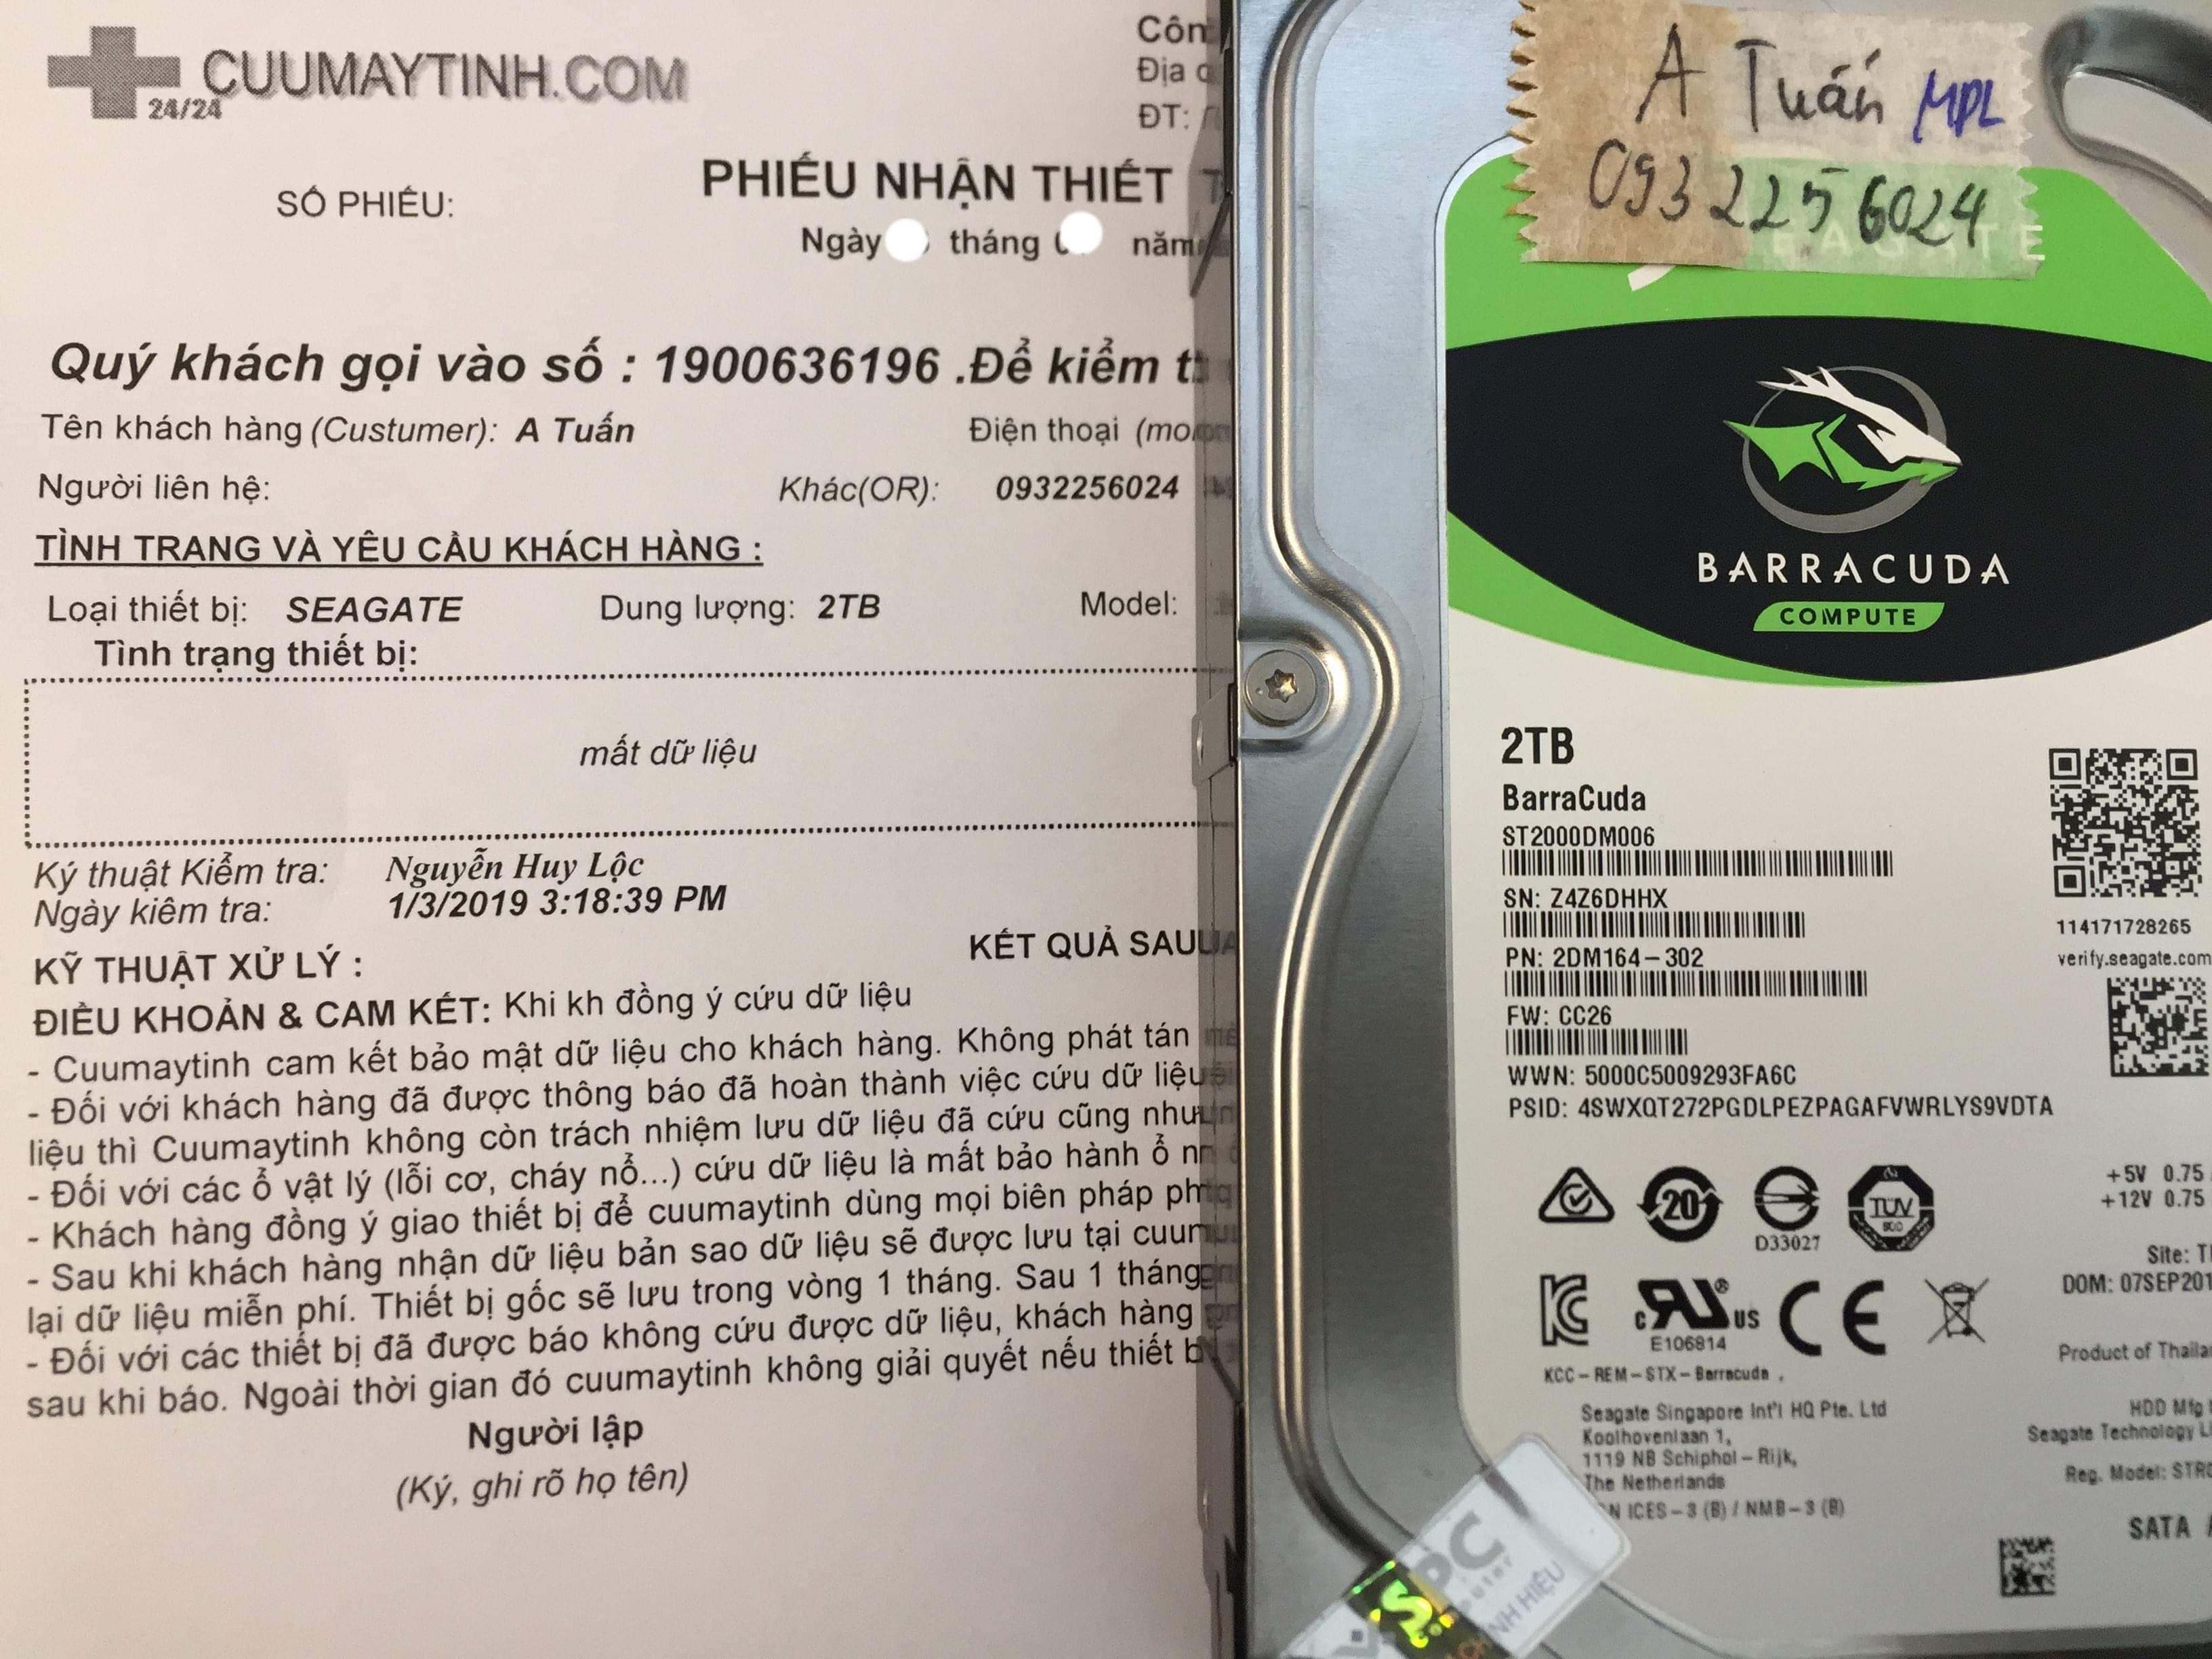 Lấy lại dữ liệu ổ cứng Seagate 2TB format nhầm 29/12/2018 - cuumaytinh